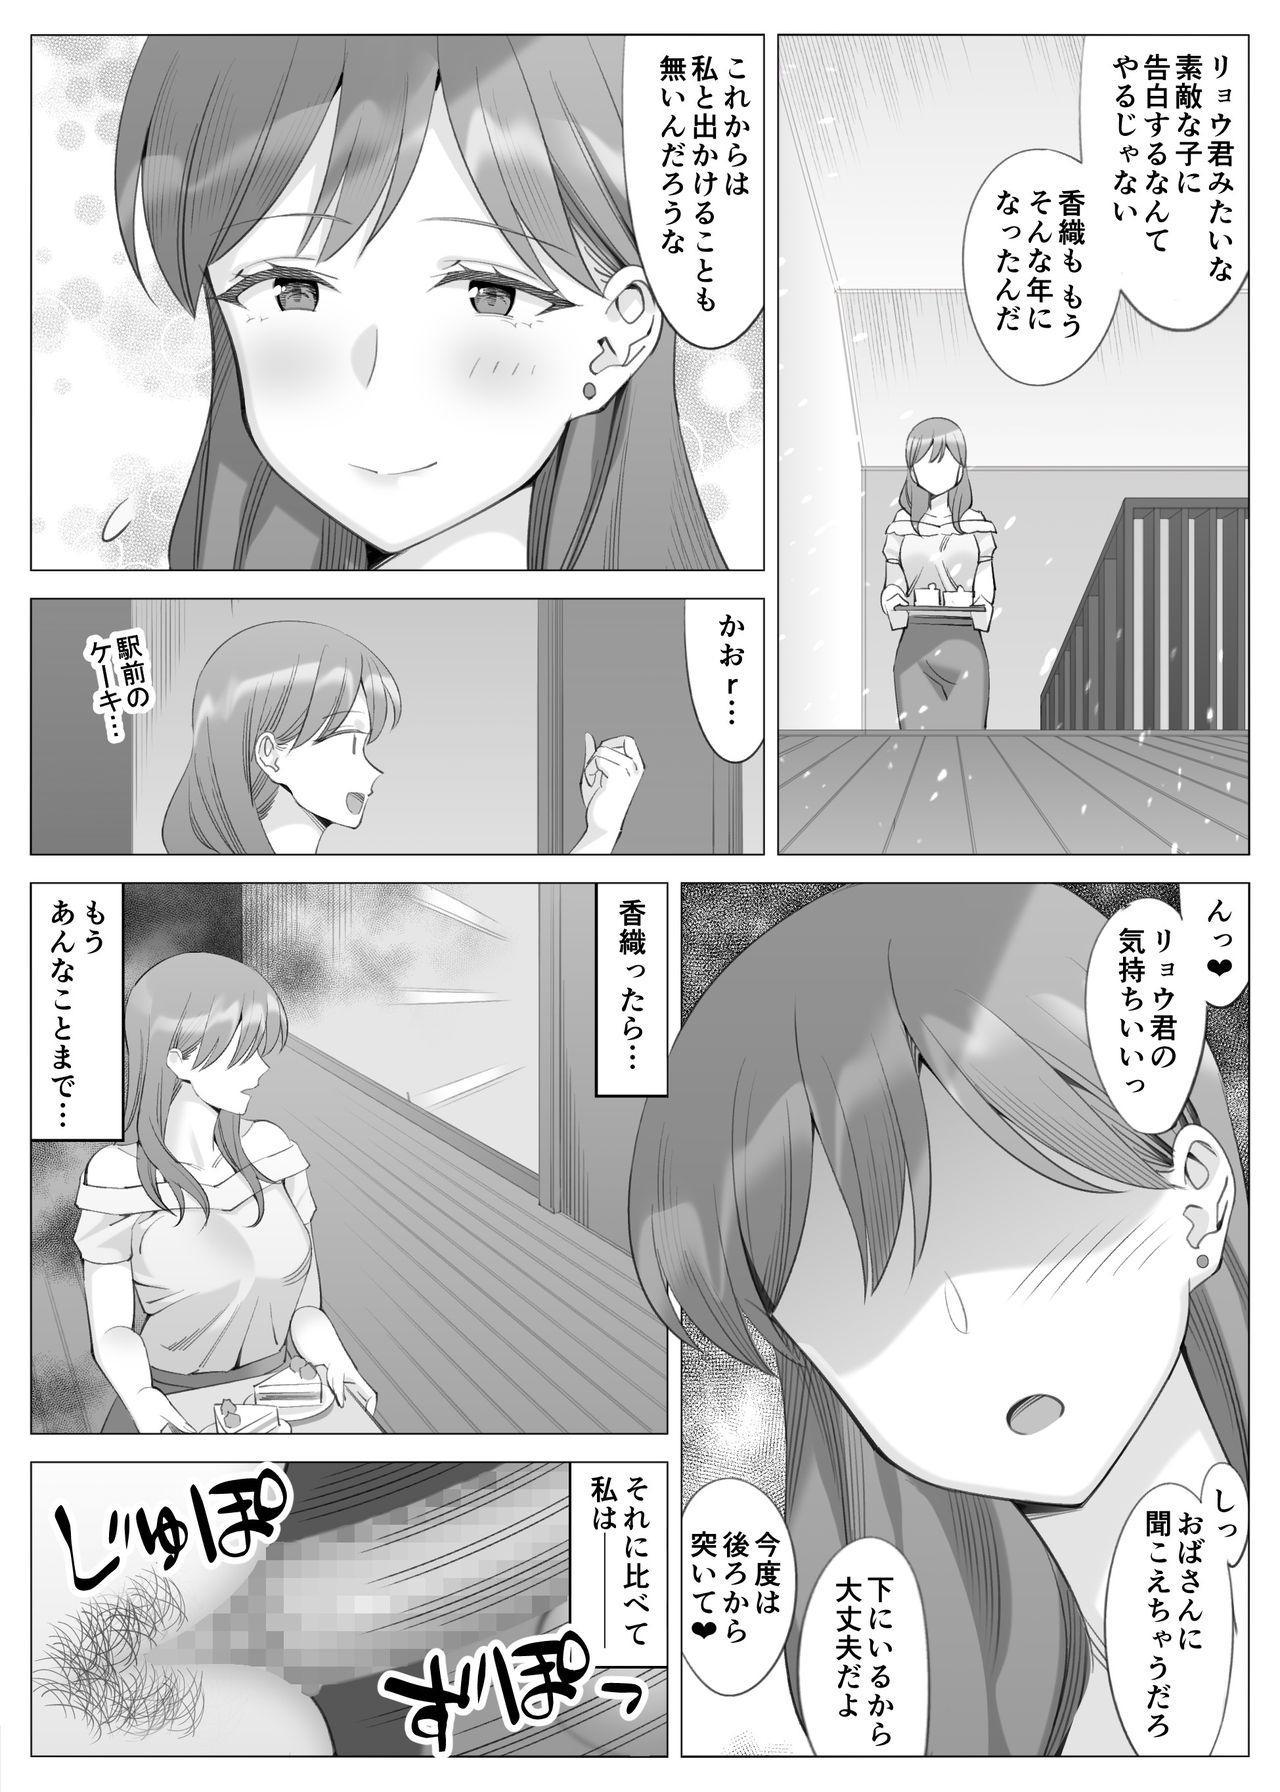 Hanamisaki no Inran na Hansei 44